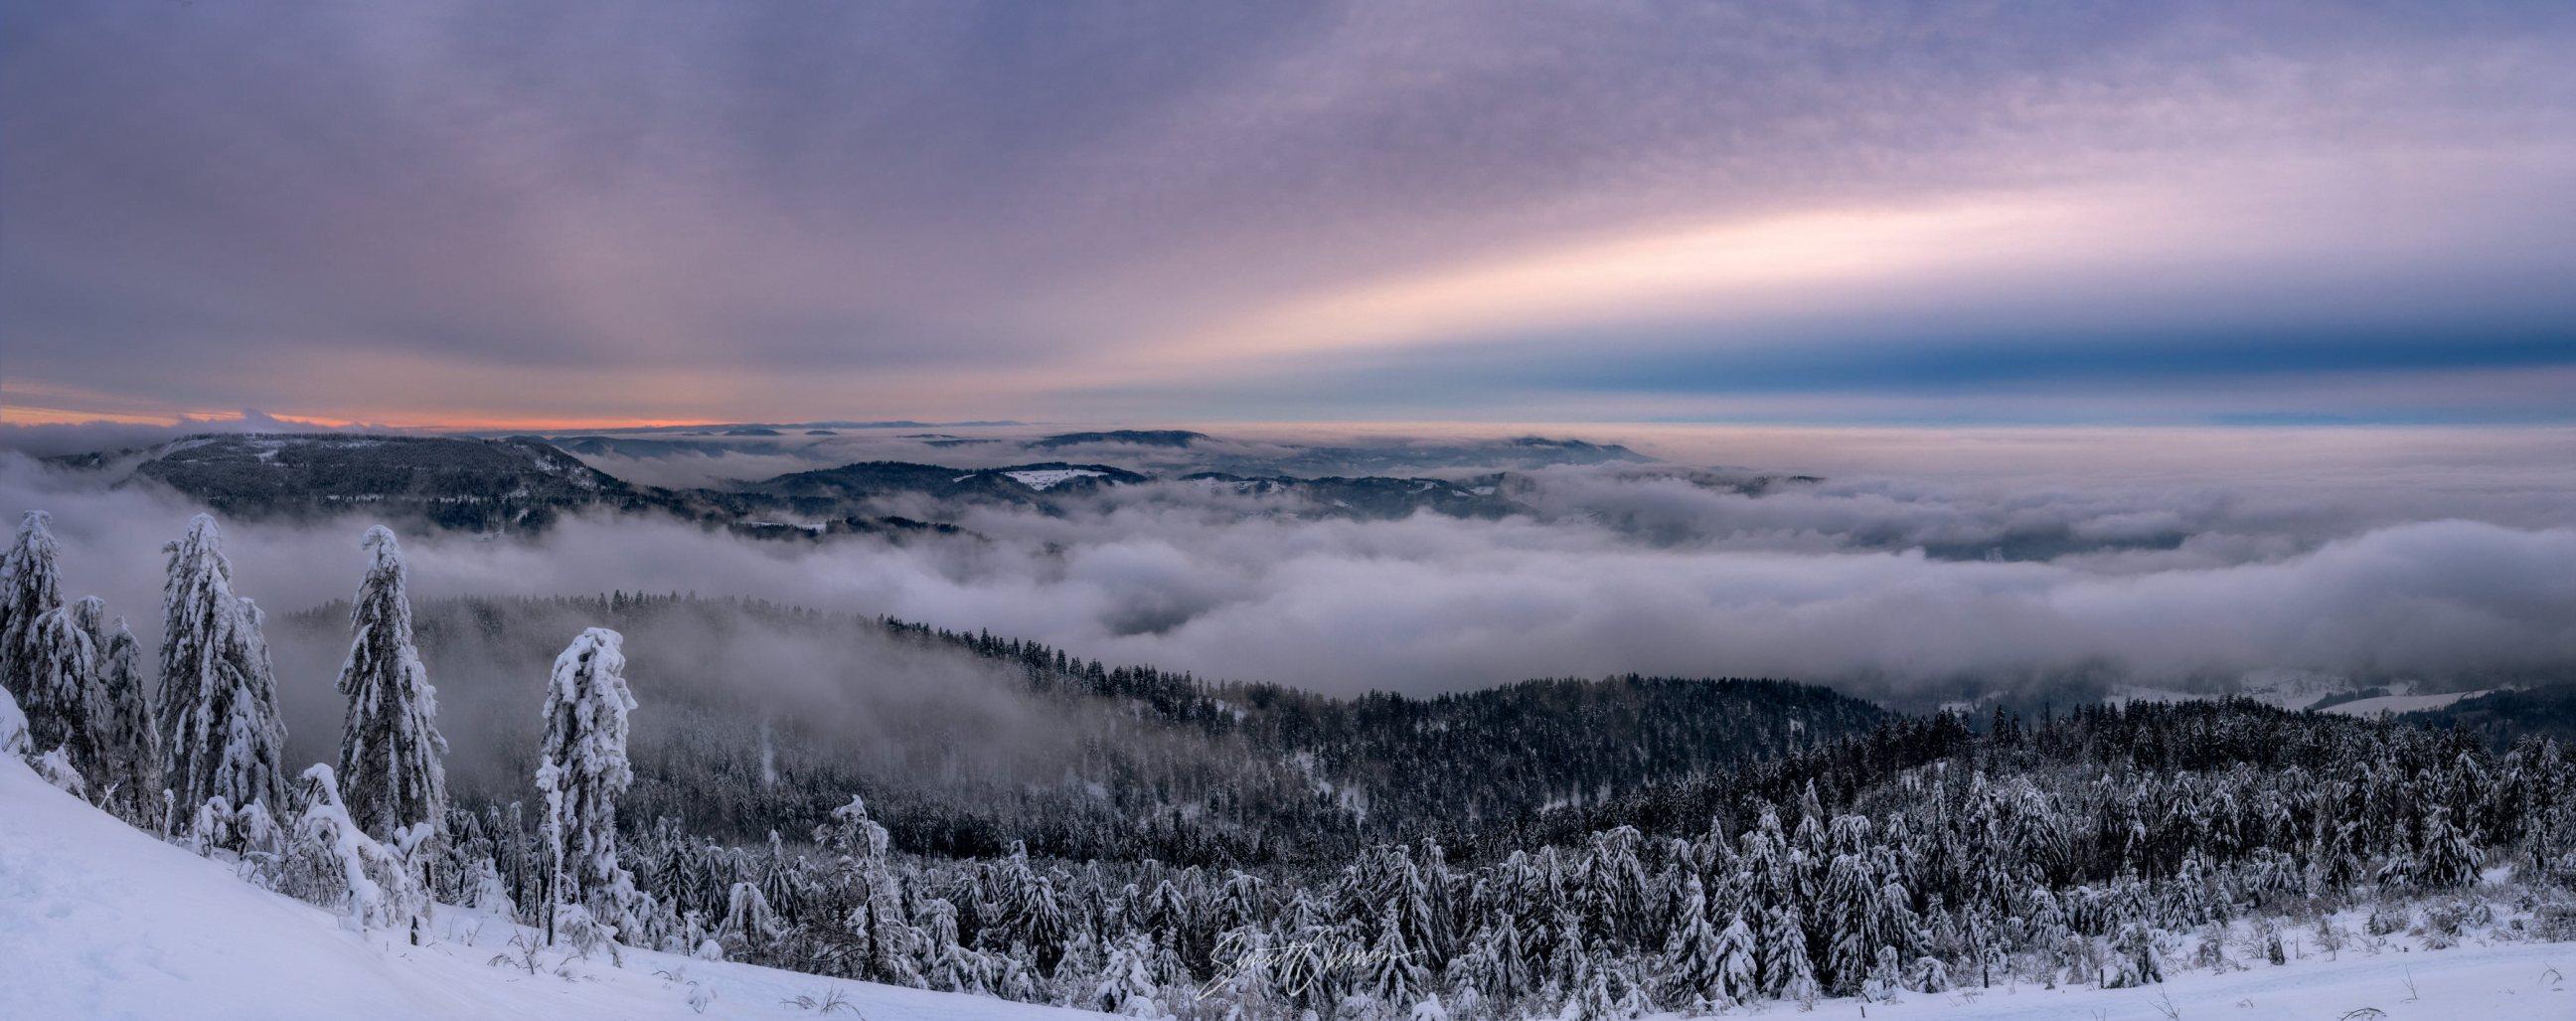 Sunset over Black Forest, Germany